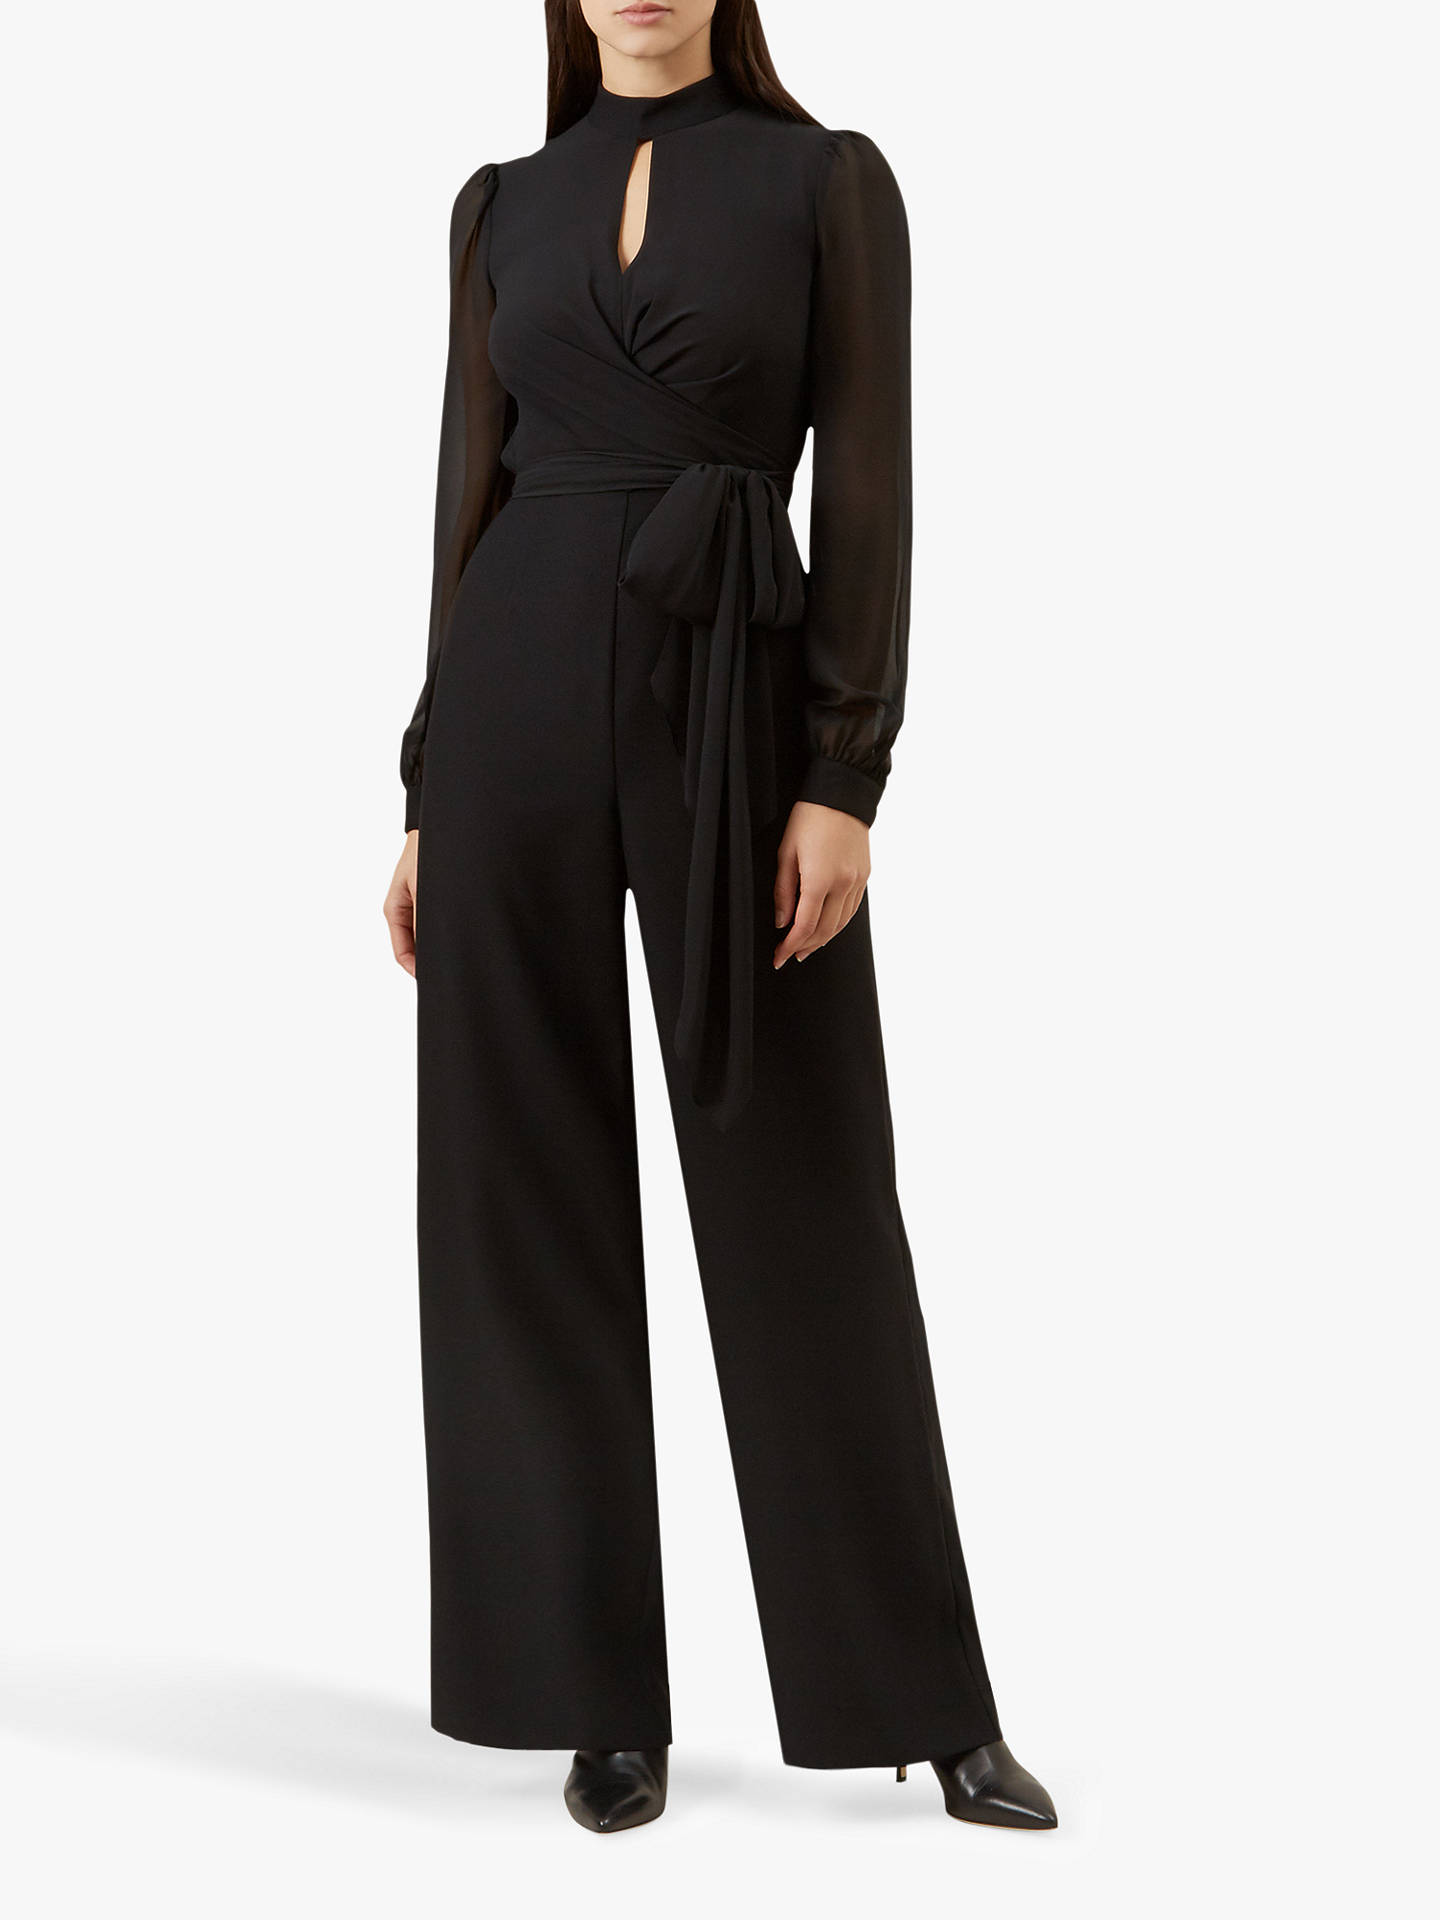 offer discounts new varieties latest style Hobbs Vera Jumpsuit, Black at John Lewis & Partners